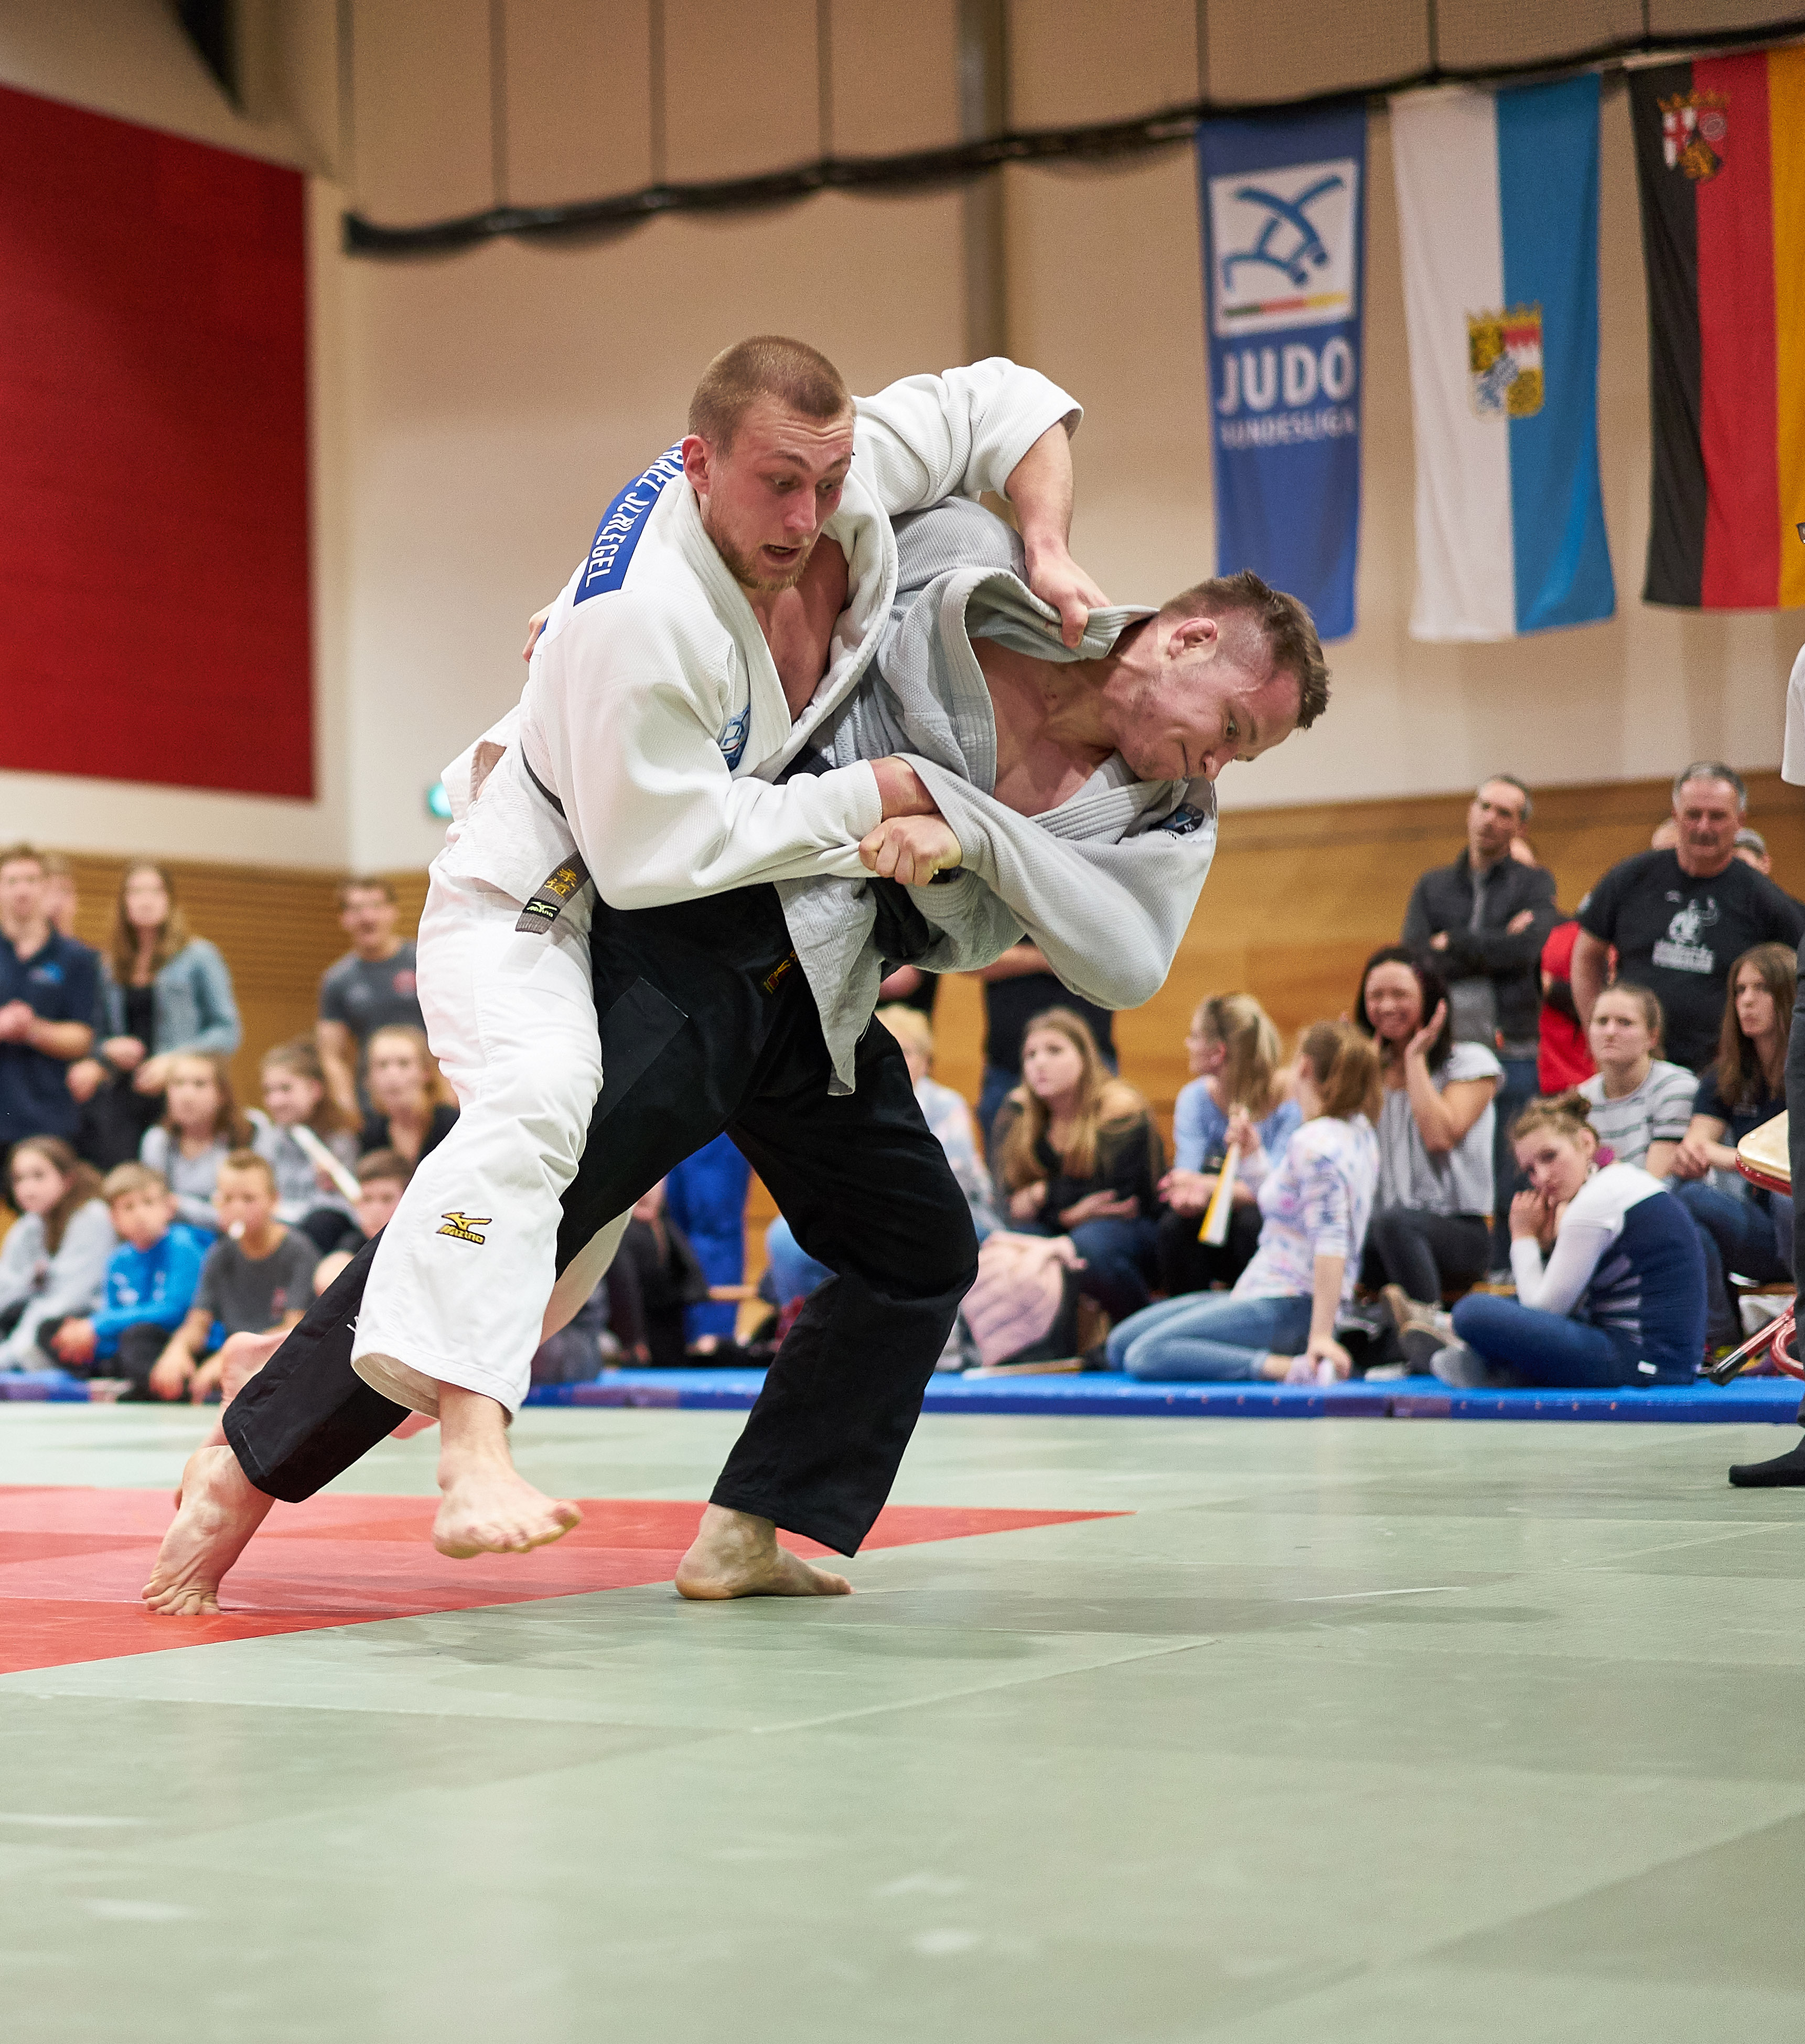 Judo Bundesliga Leipzig